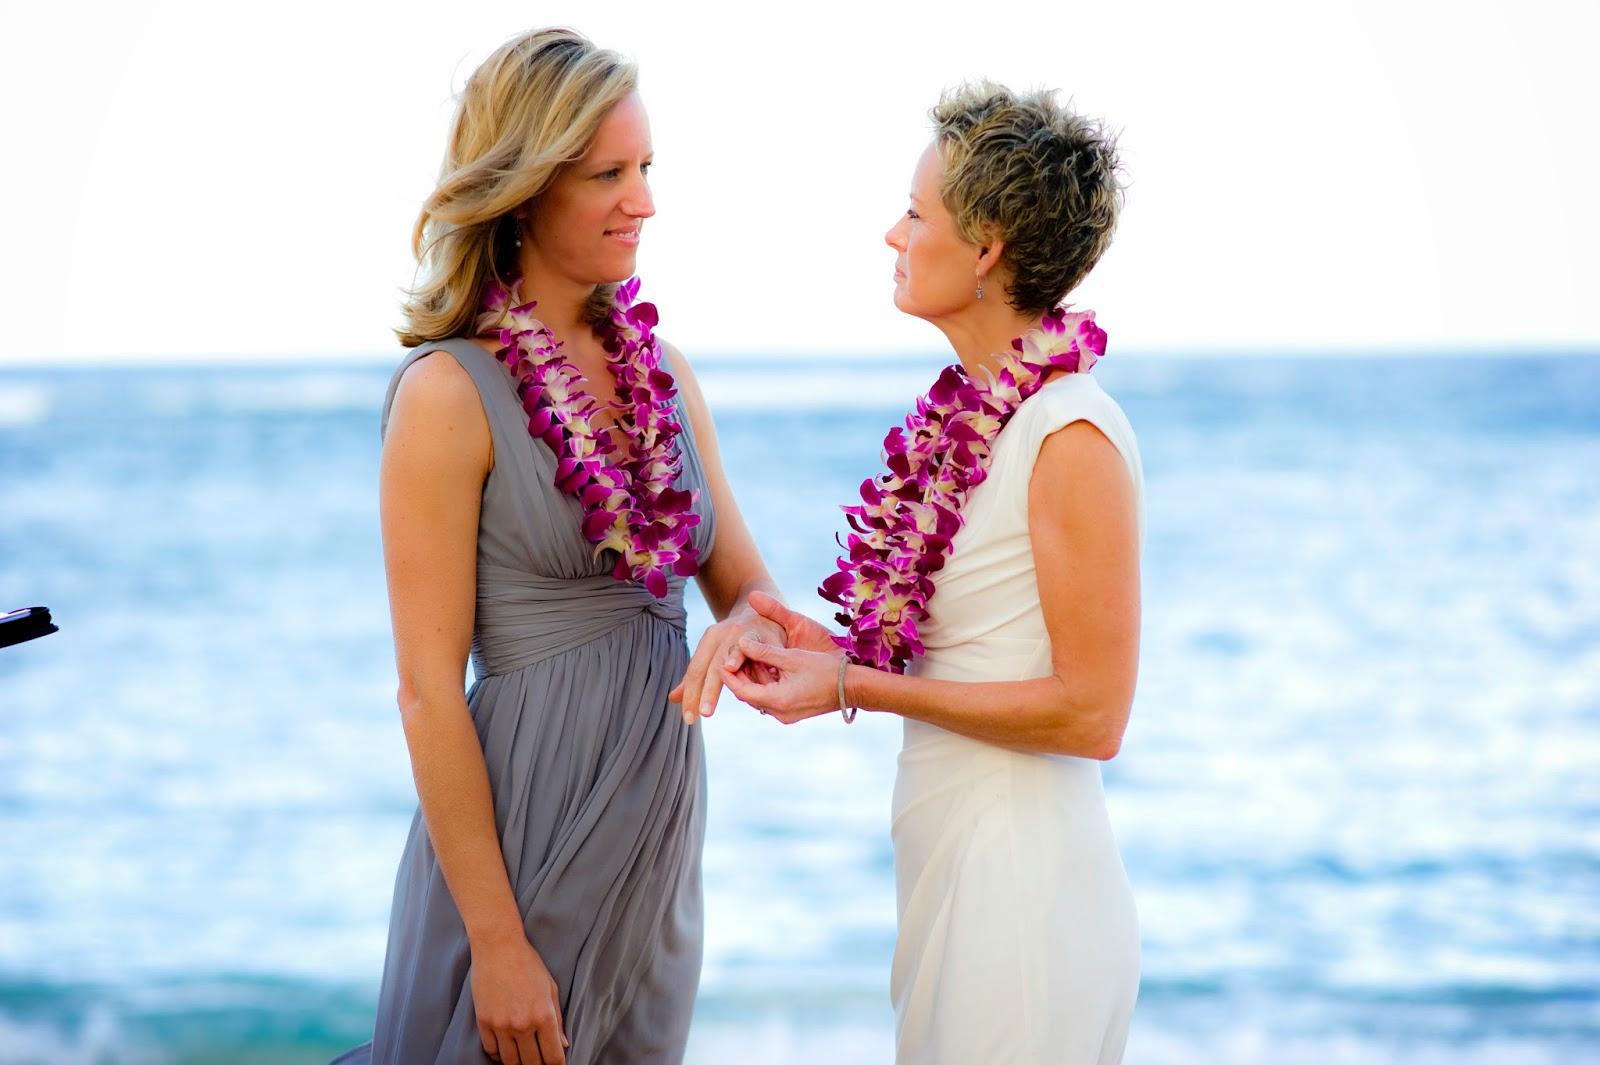 lgbt weddings hawaii, maui gay weddings planner, maui gay wedding photogrpahers